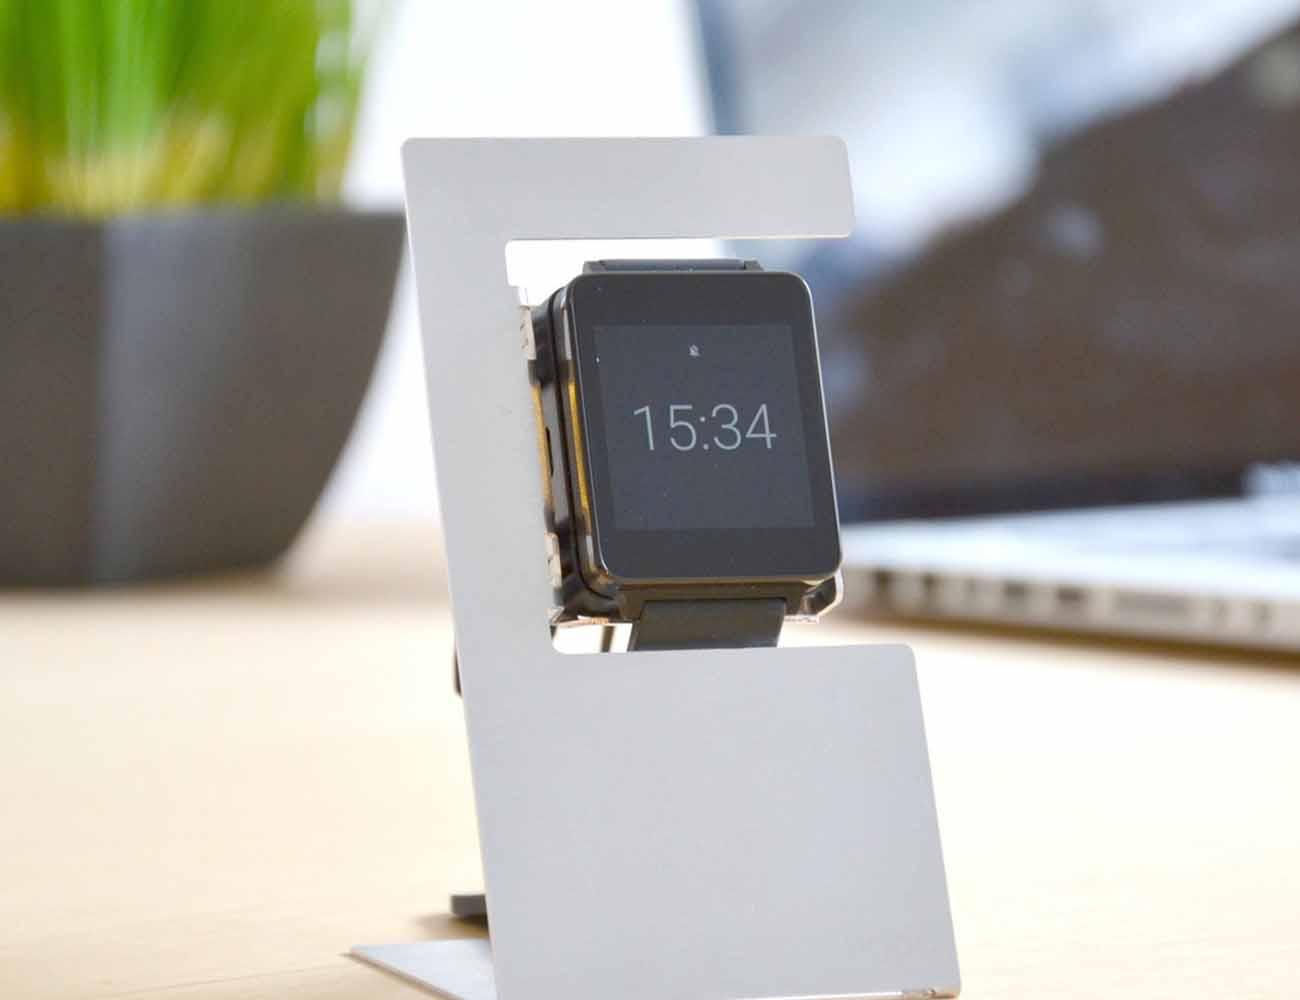 Smartwatch Charging Dock by manugoo